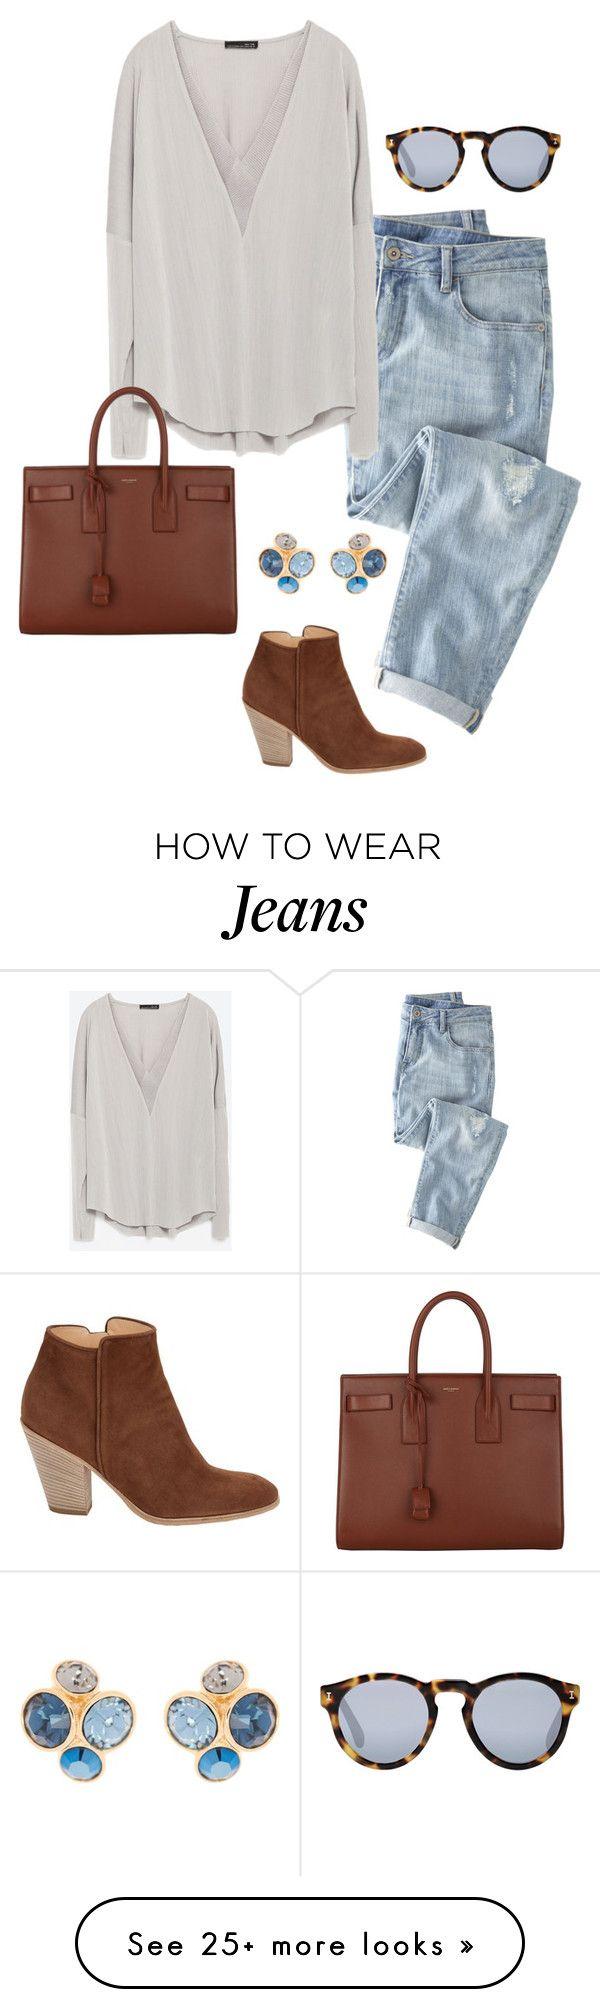 """boyfriend jeans"" by kcunningham1 on Polyvore featuring moda, Wrap, Zara, Illest…"